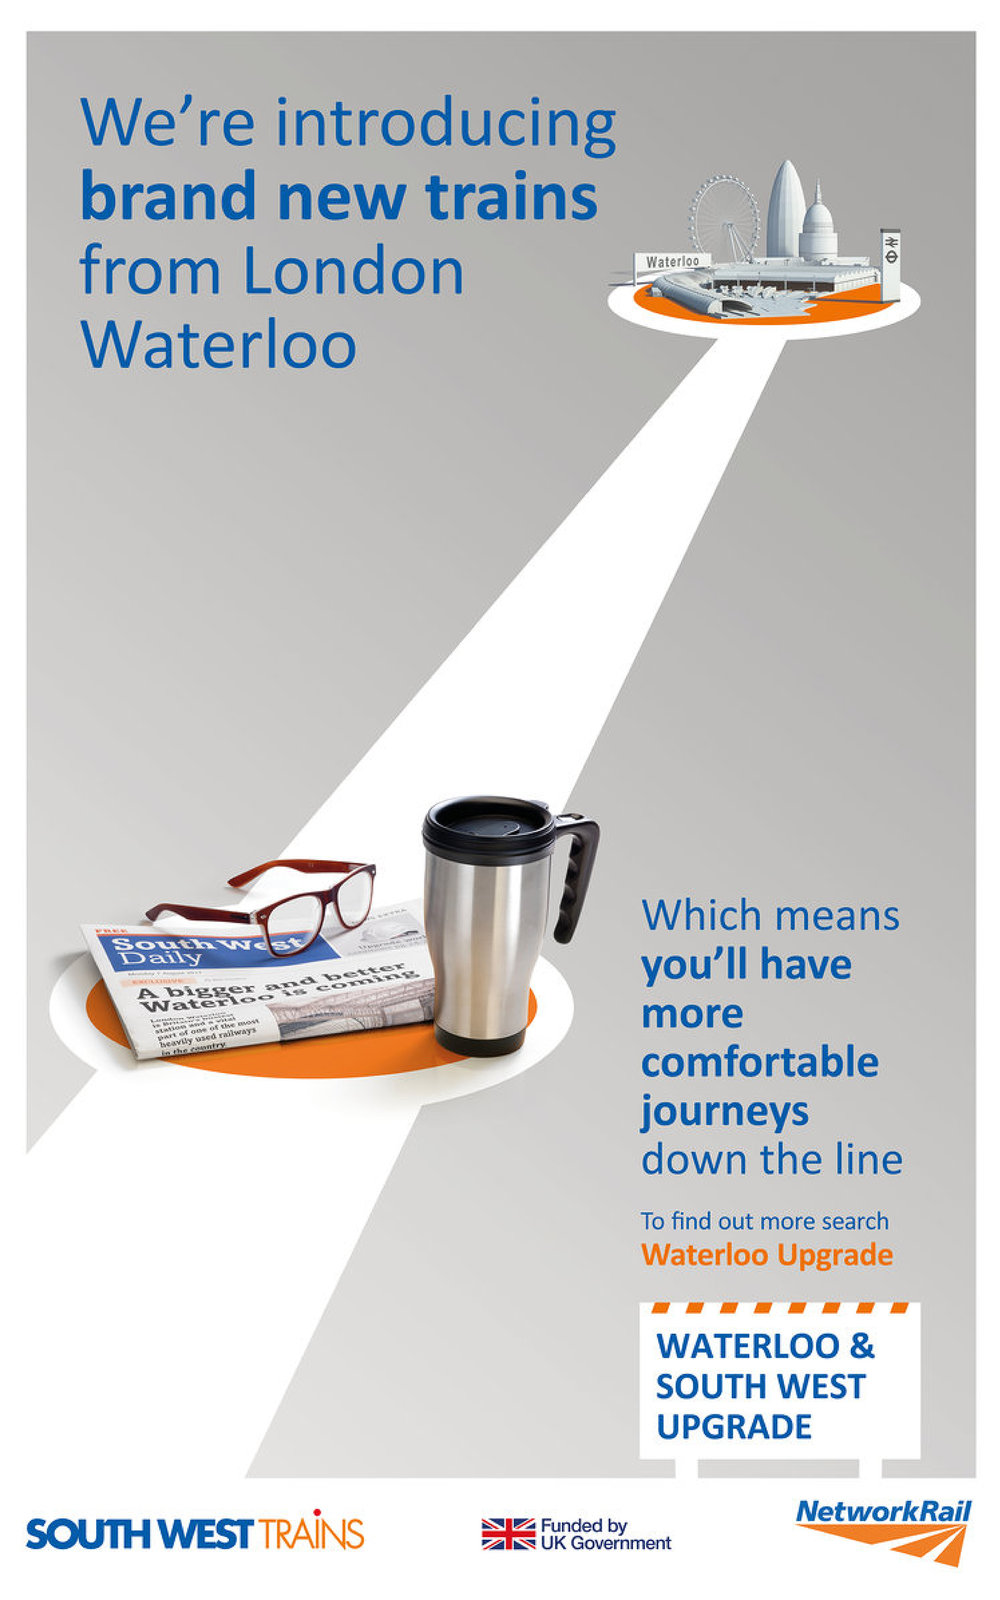 500624_SWT_Waterloo_Benefits_Posters.jpg